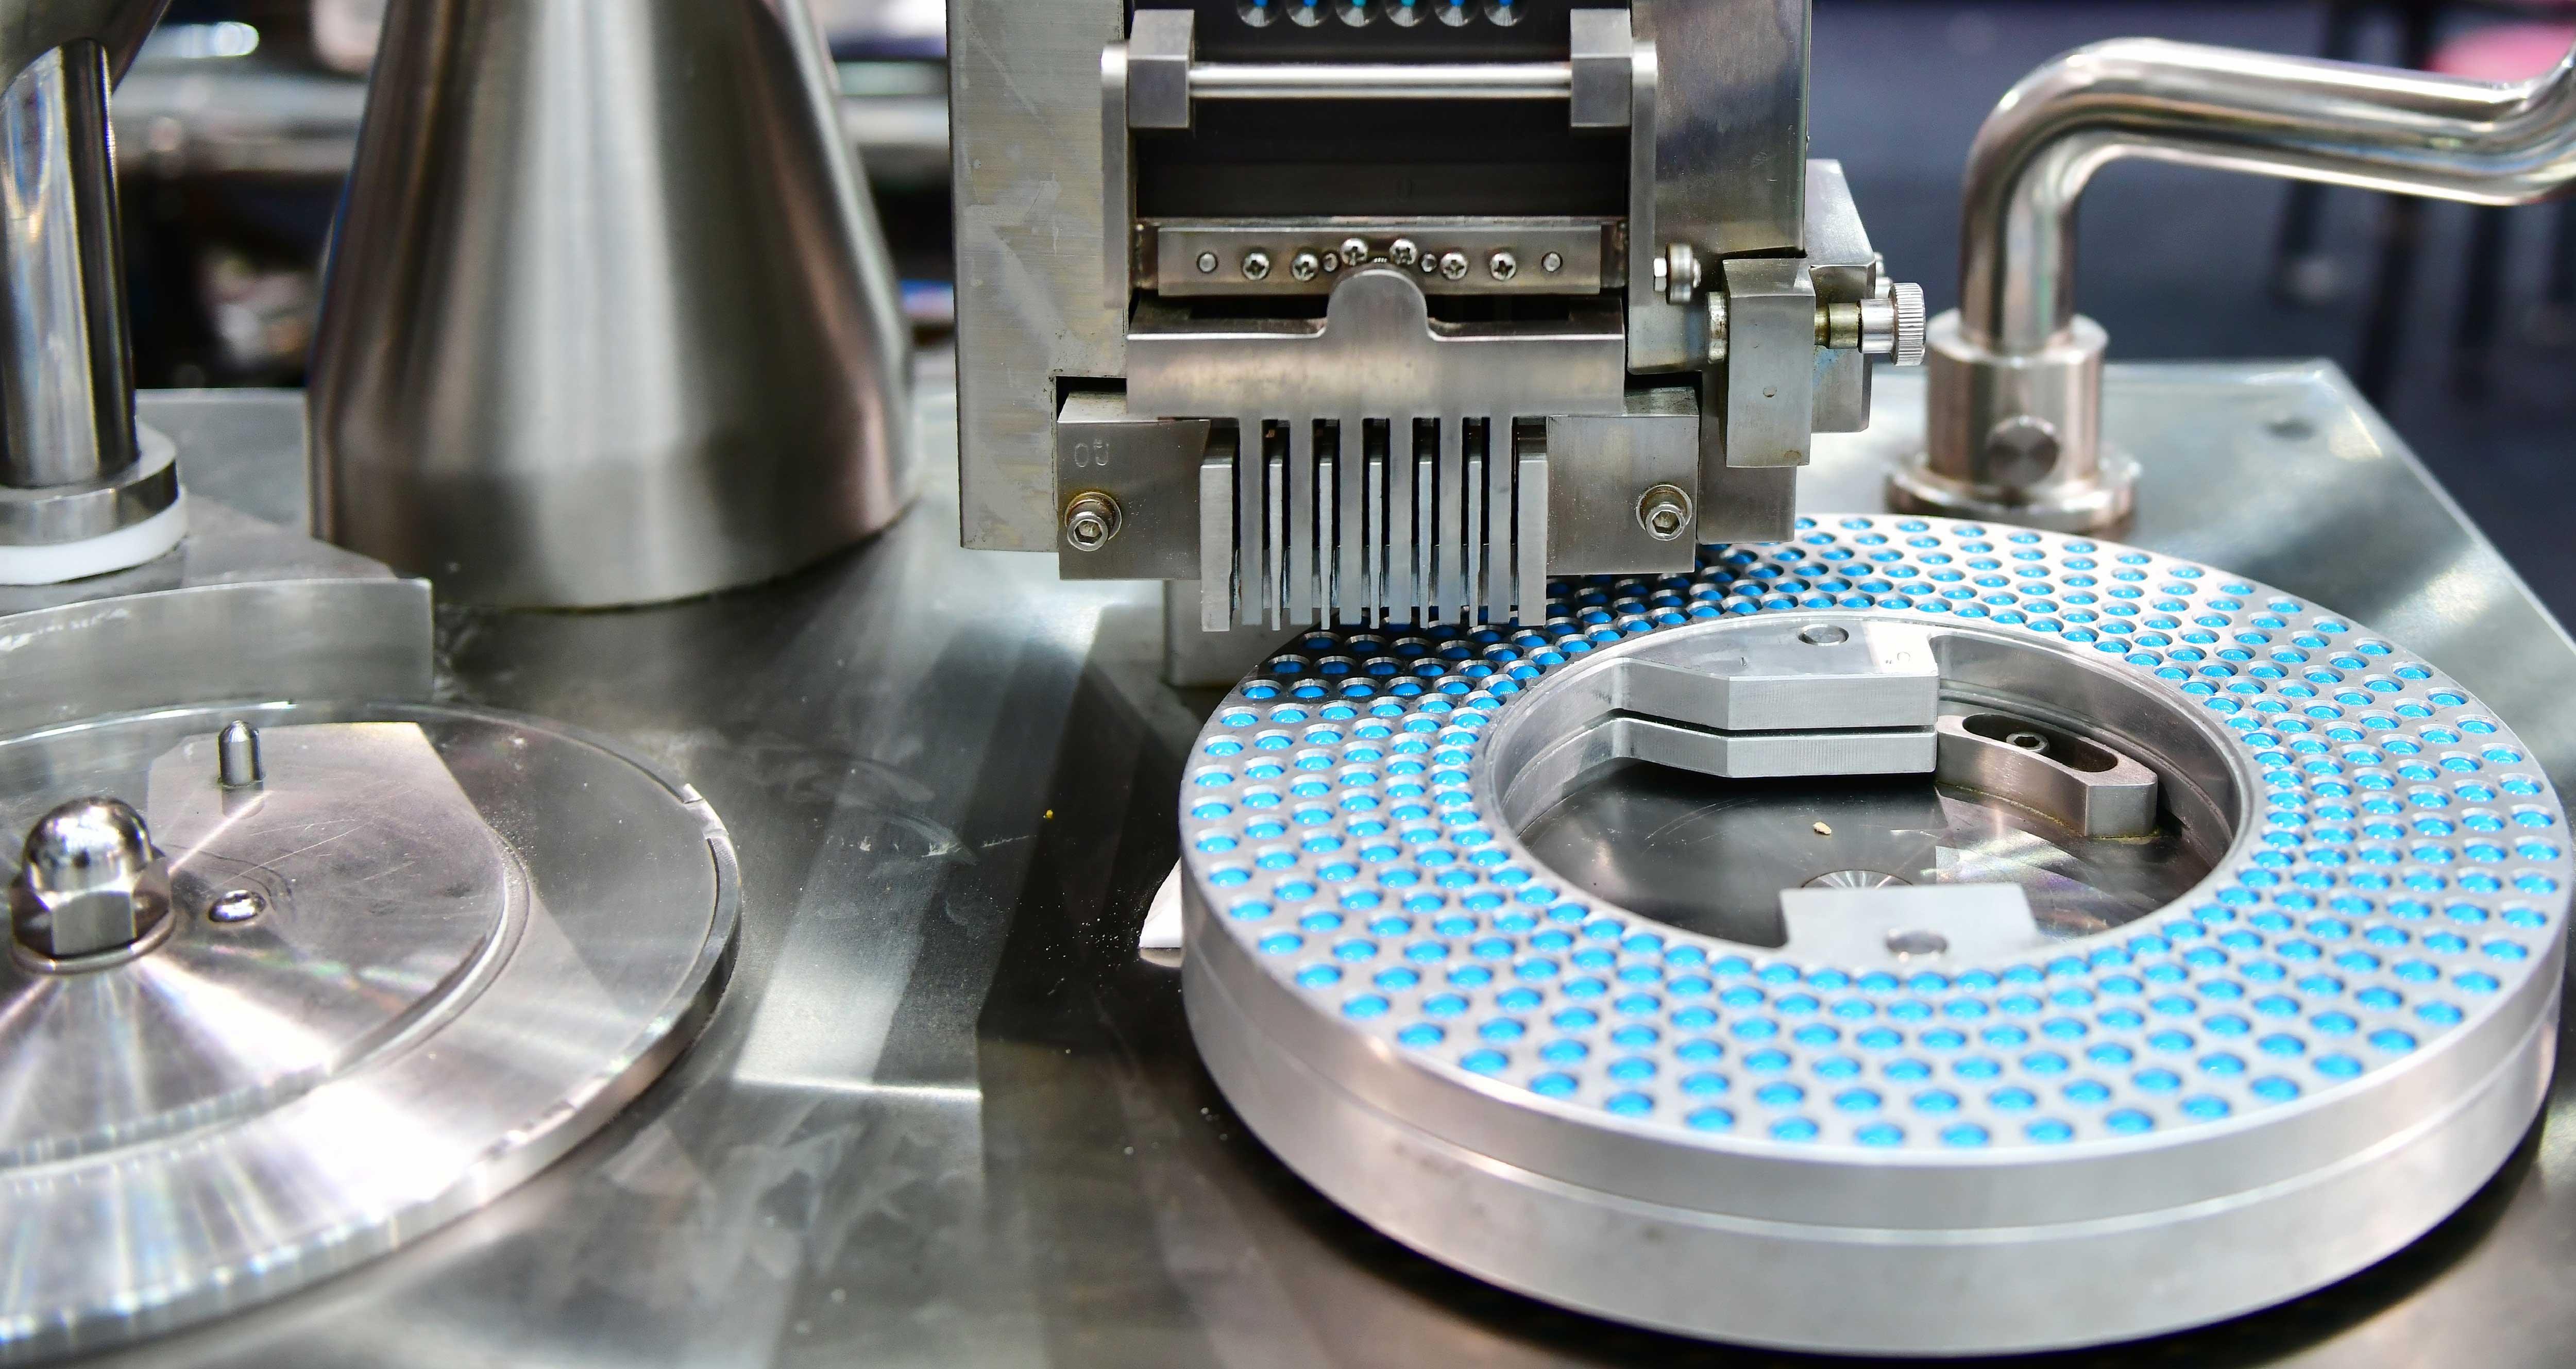 blue-capsule-medicine-pill-production-line-industrial